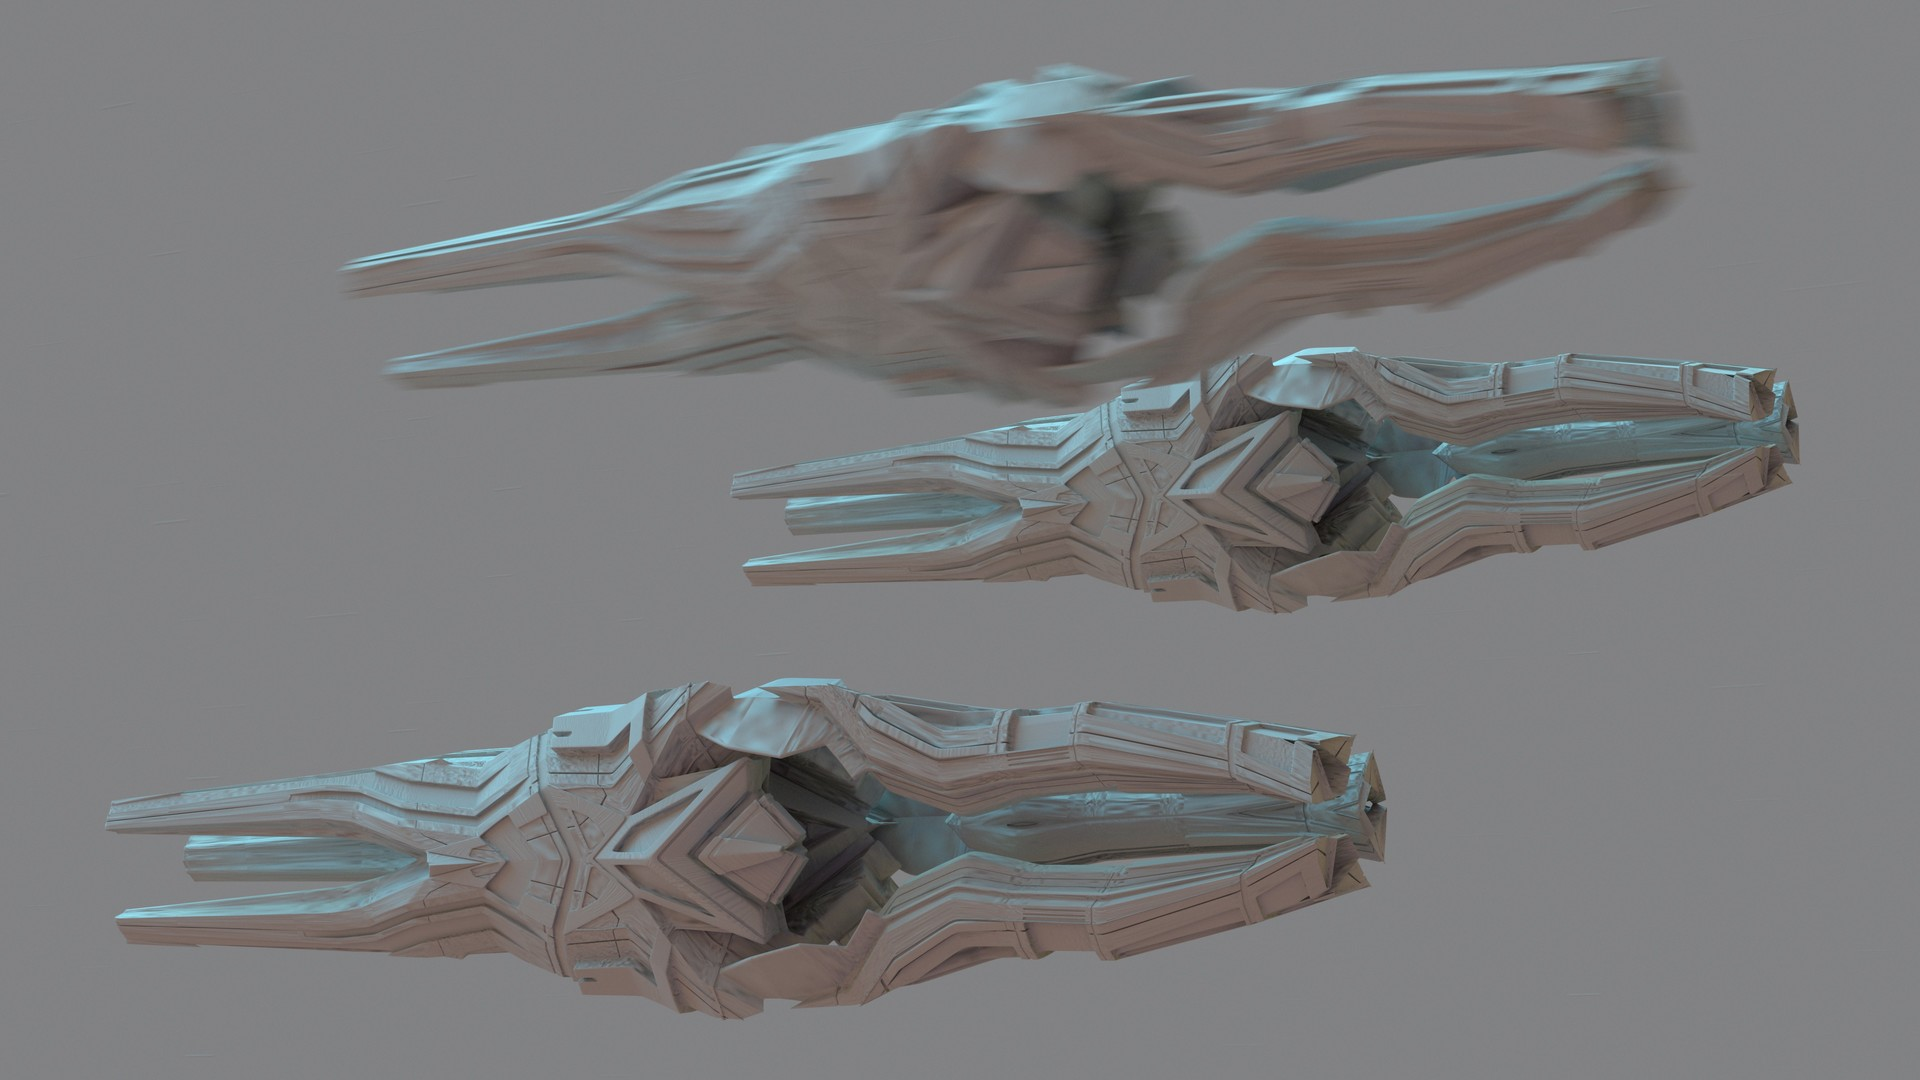 Kresimir jelusic robob3ar 246 150616 voidseeker mkii clay